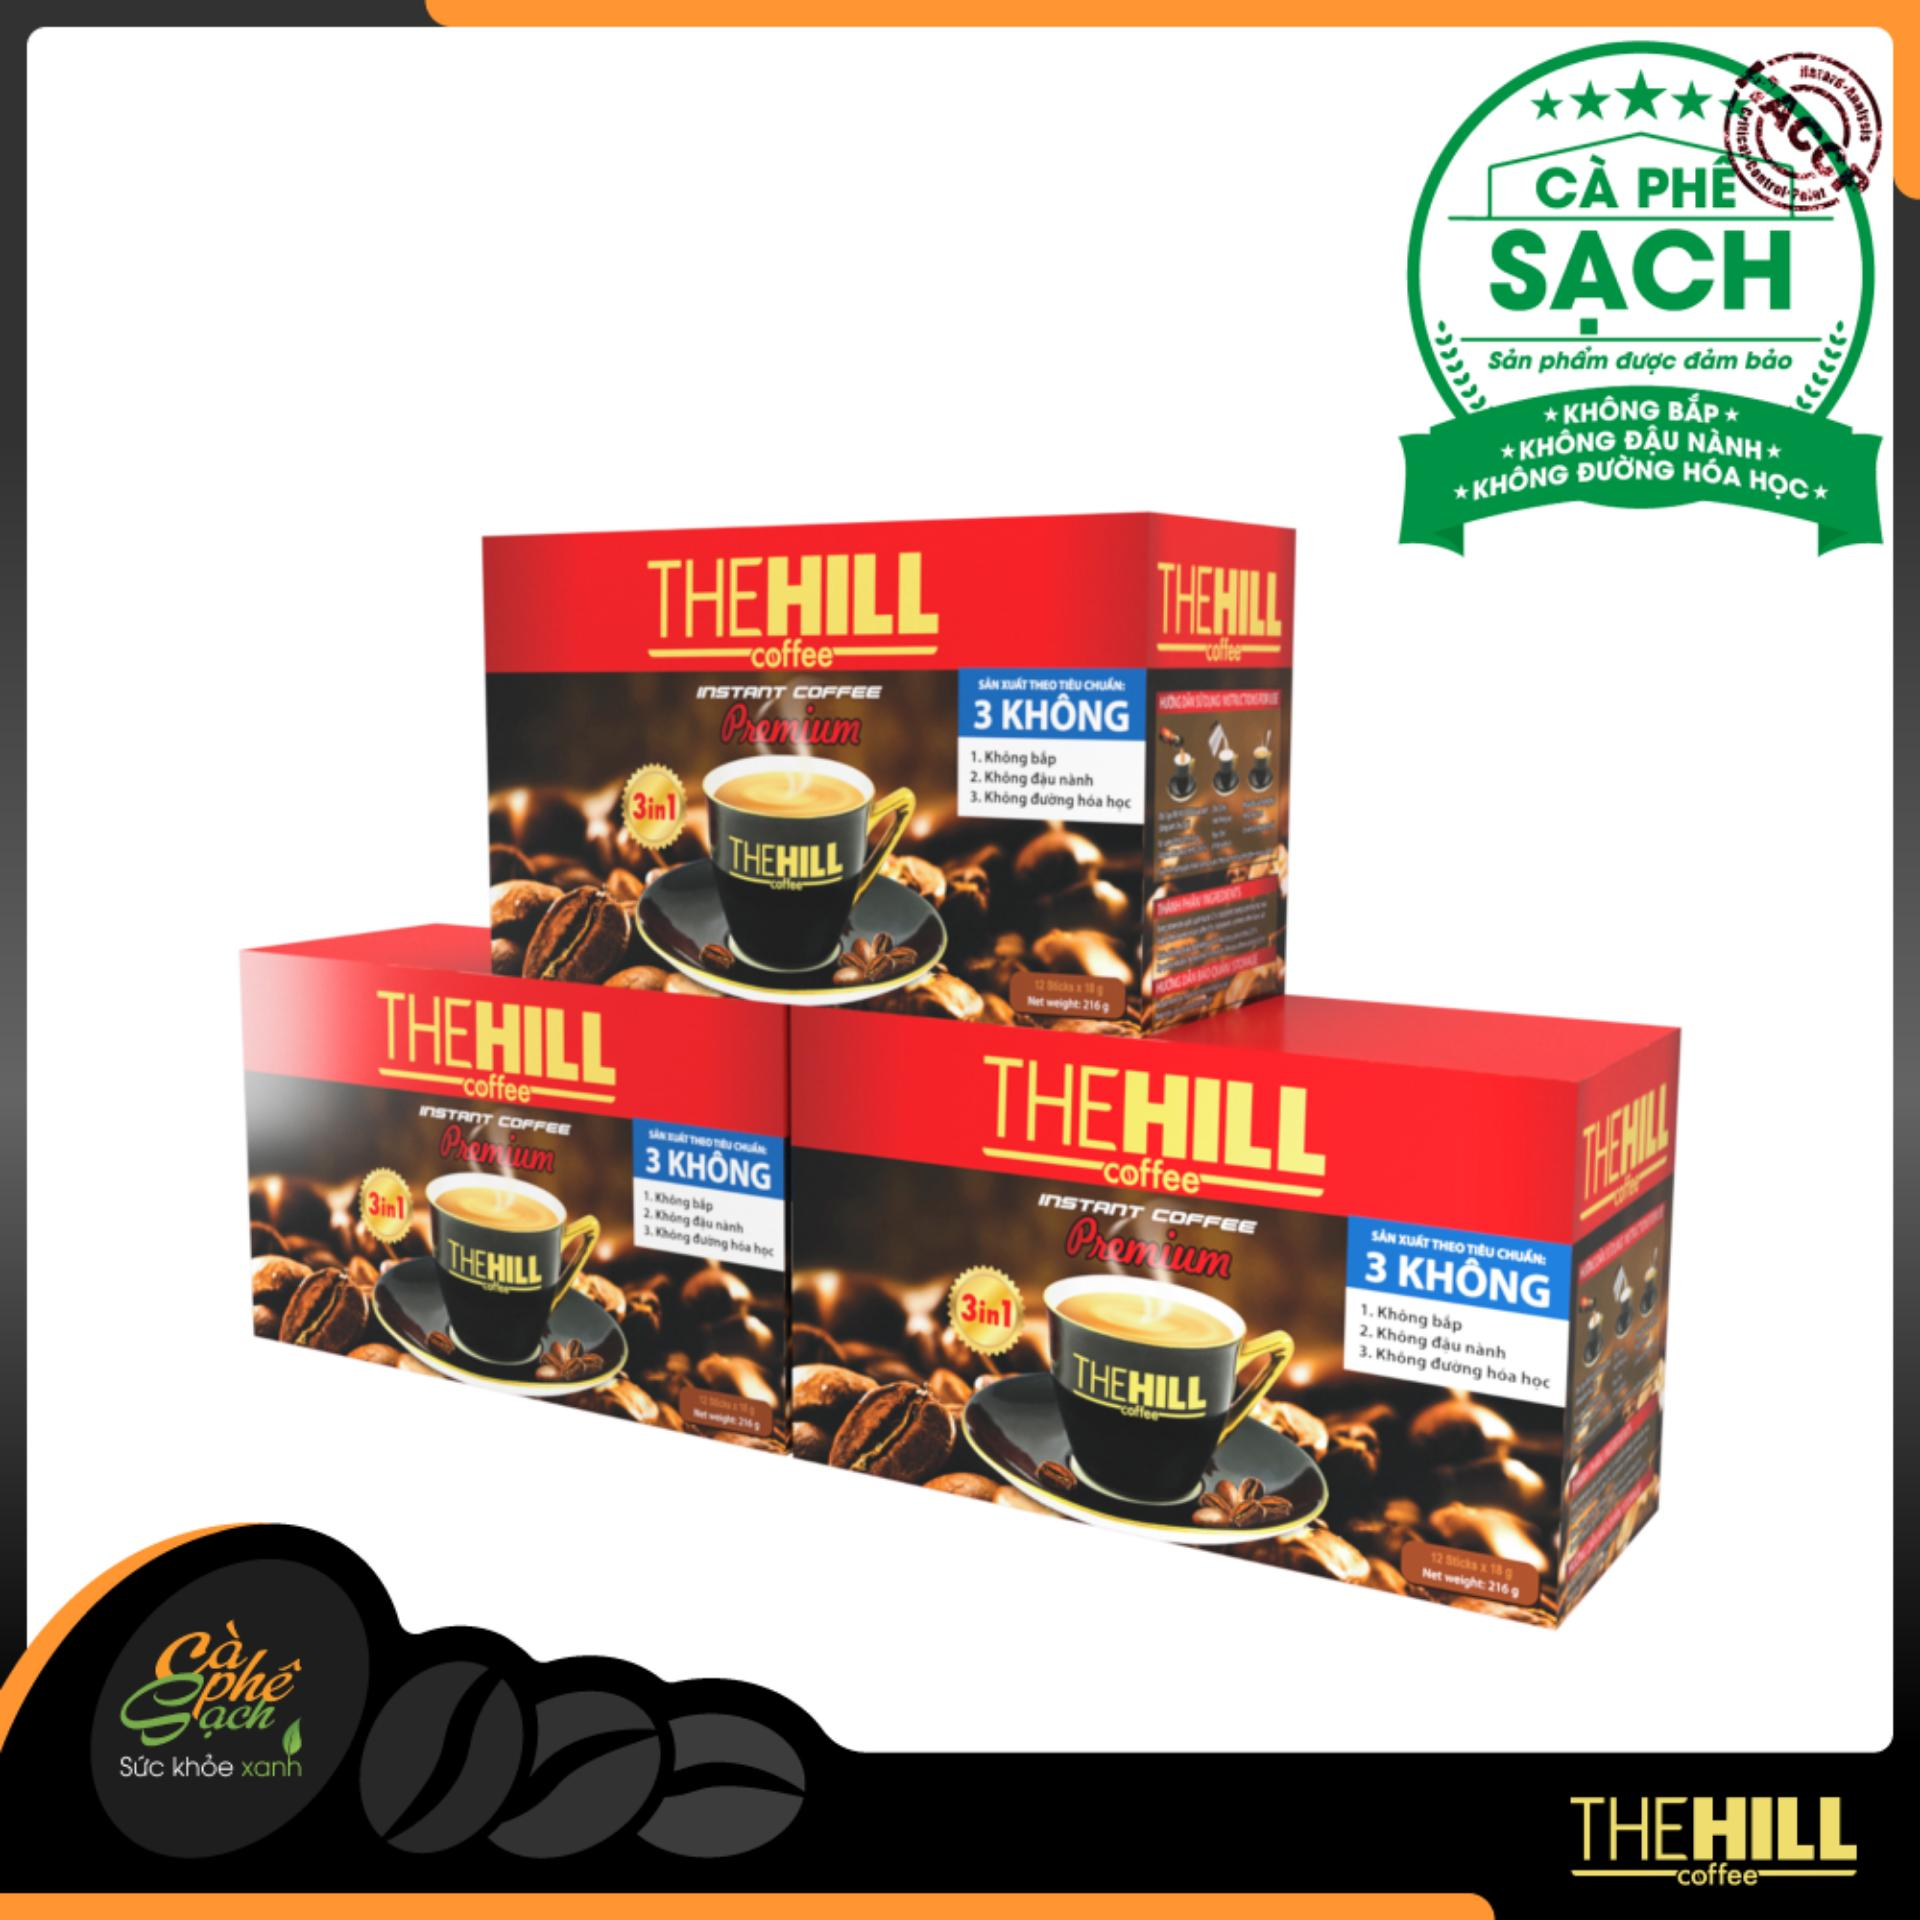 Giá Bán Combo 3 Hộp Ca Phe Hoa Tan The Hill Coffee Premium The Hill Coffee